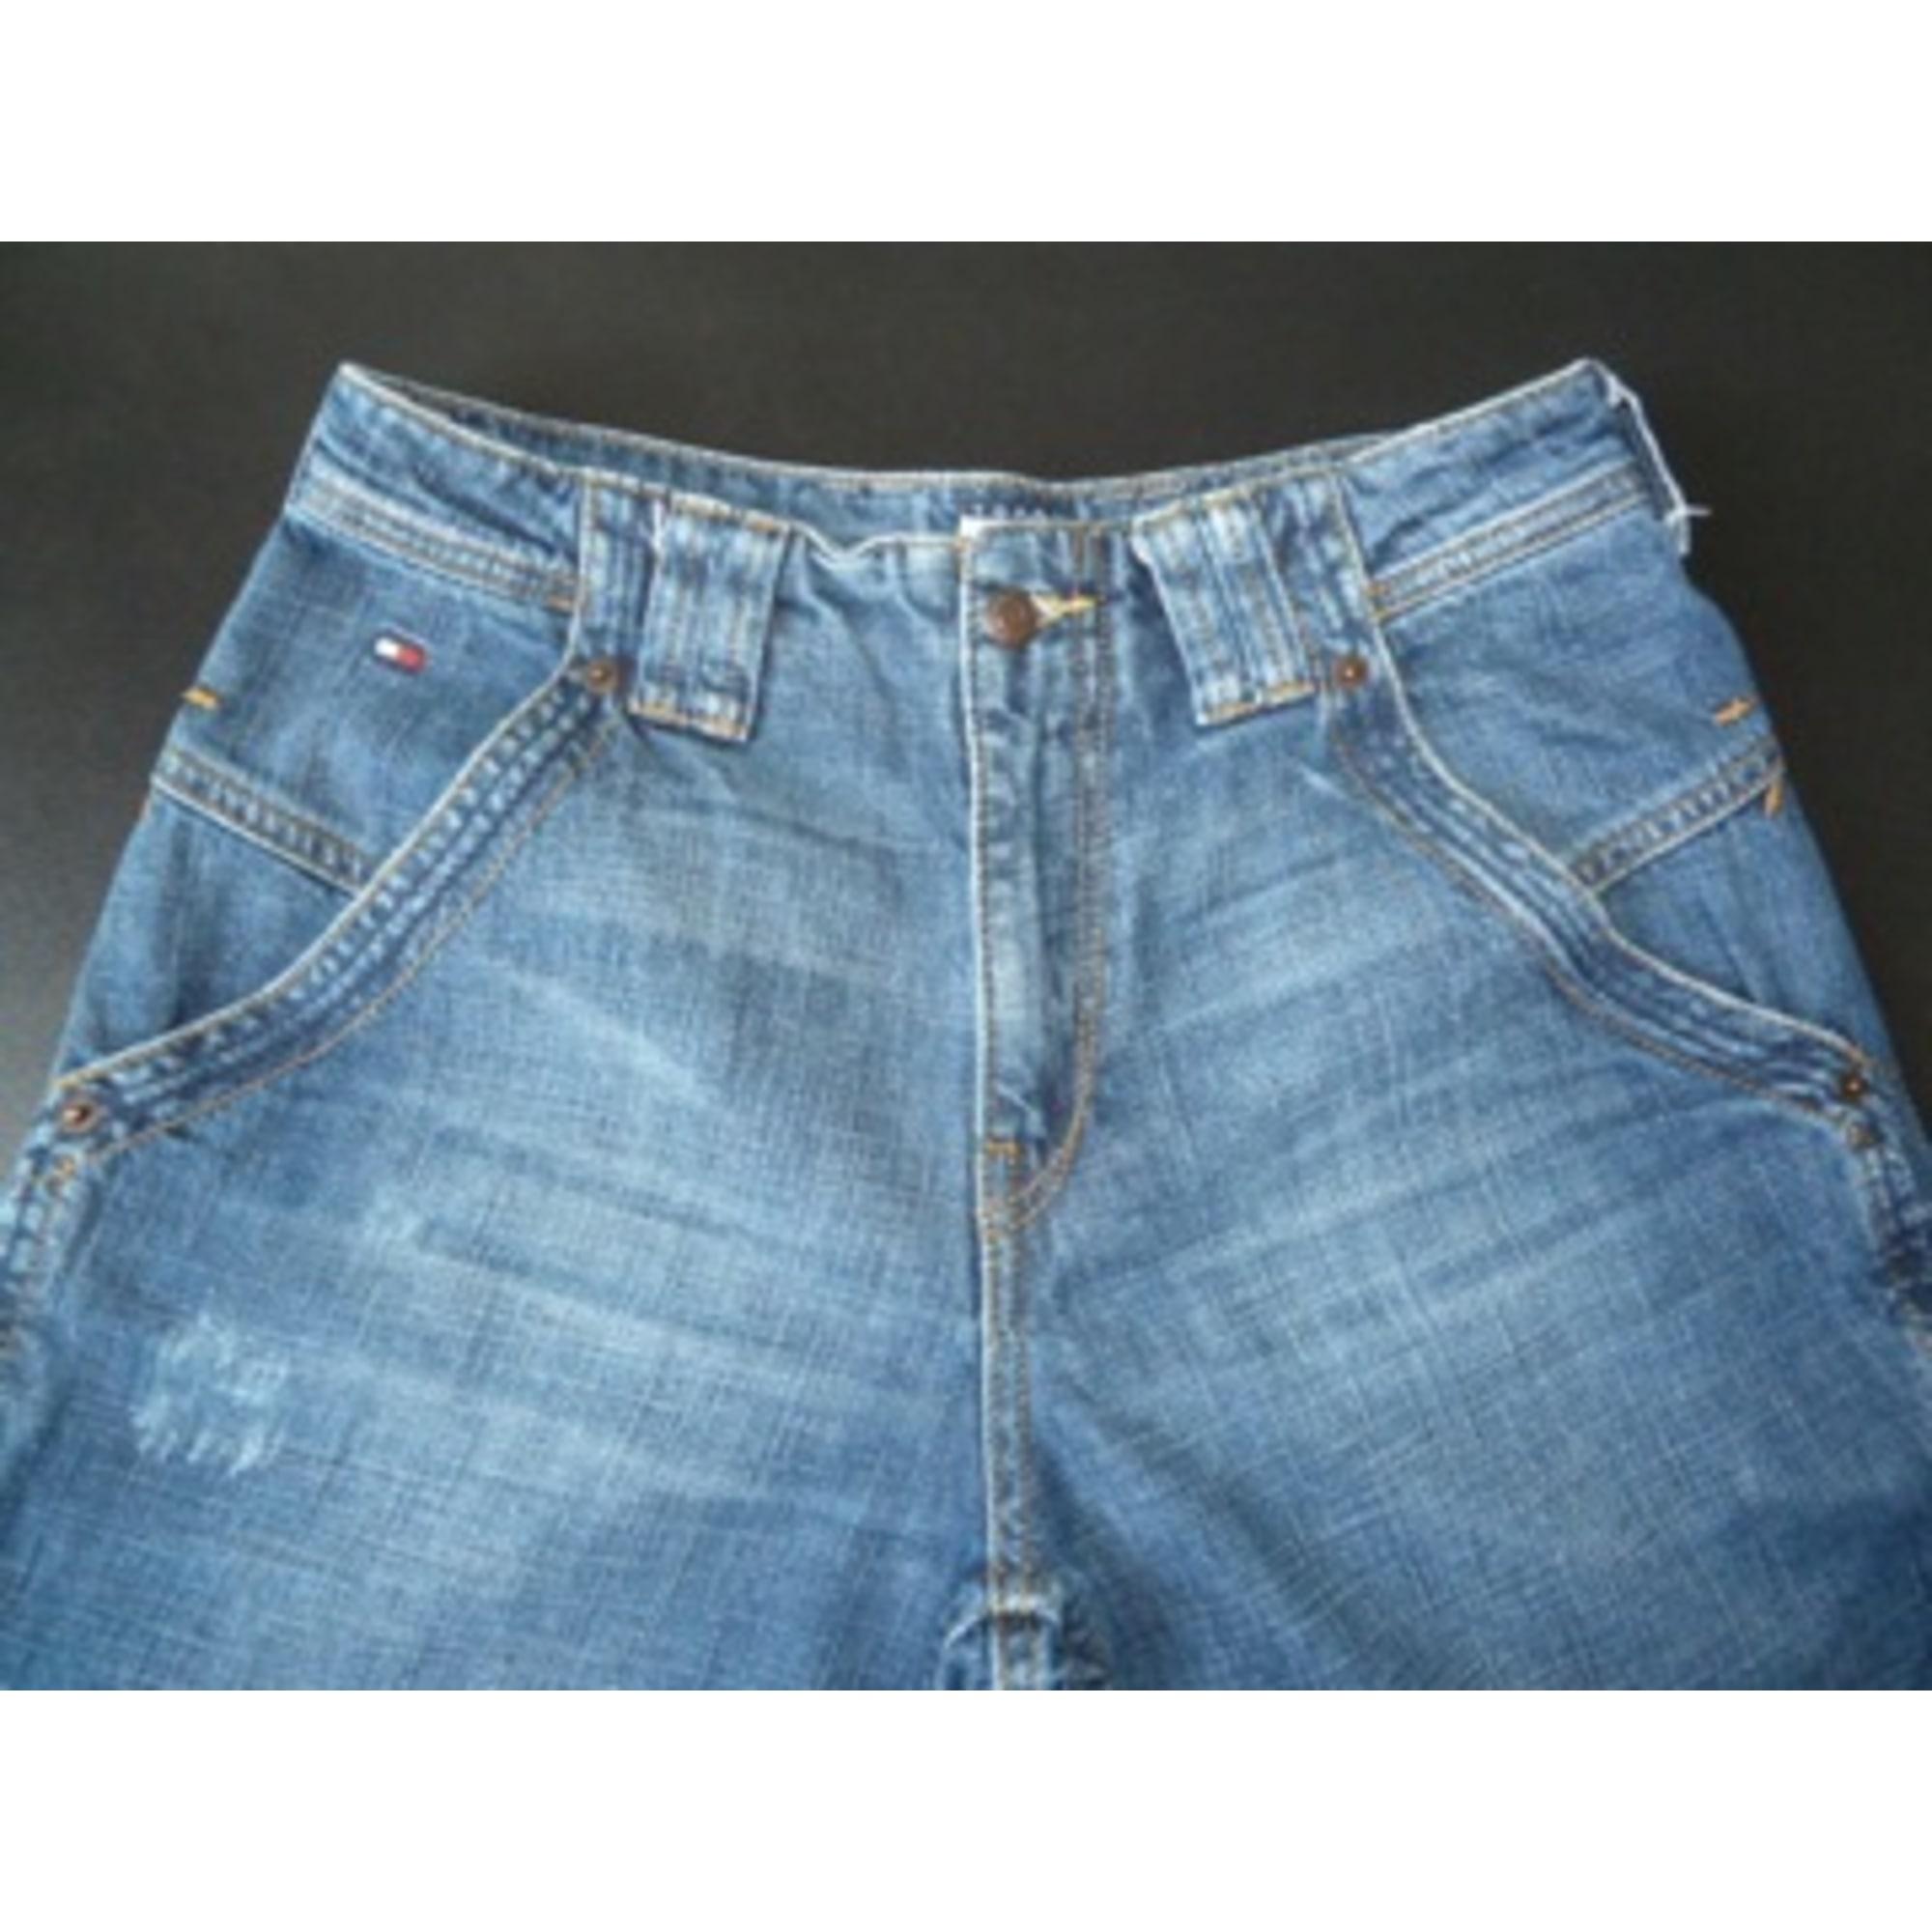 Jeans large, boyfriend TOMMY HILFIGER Bleu, bleu marine, bleu turquoise